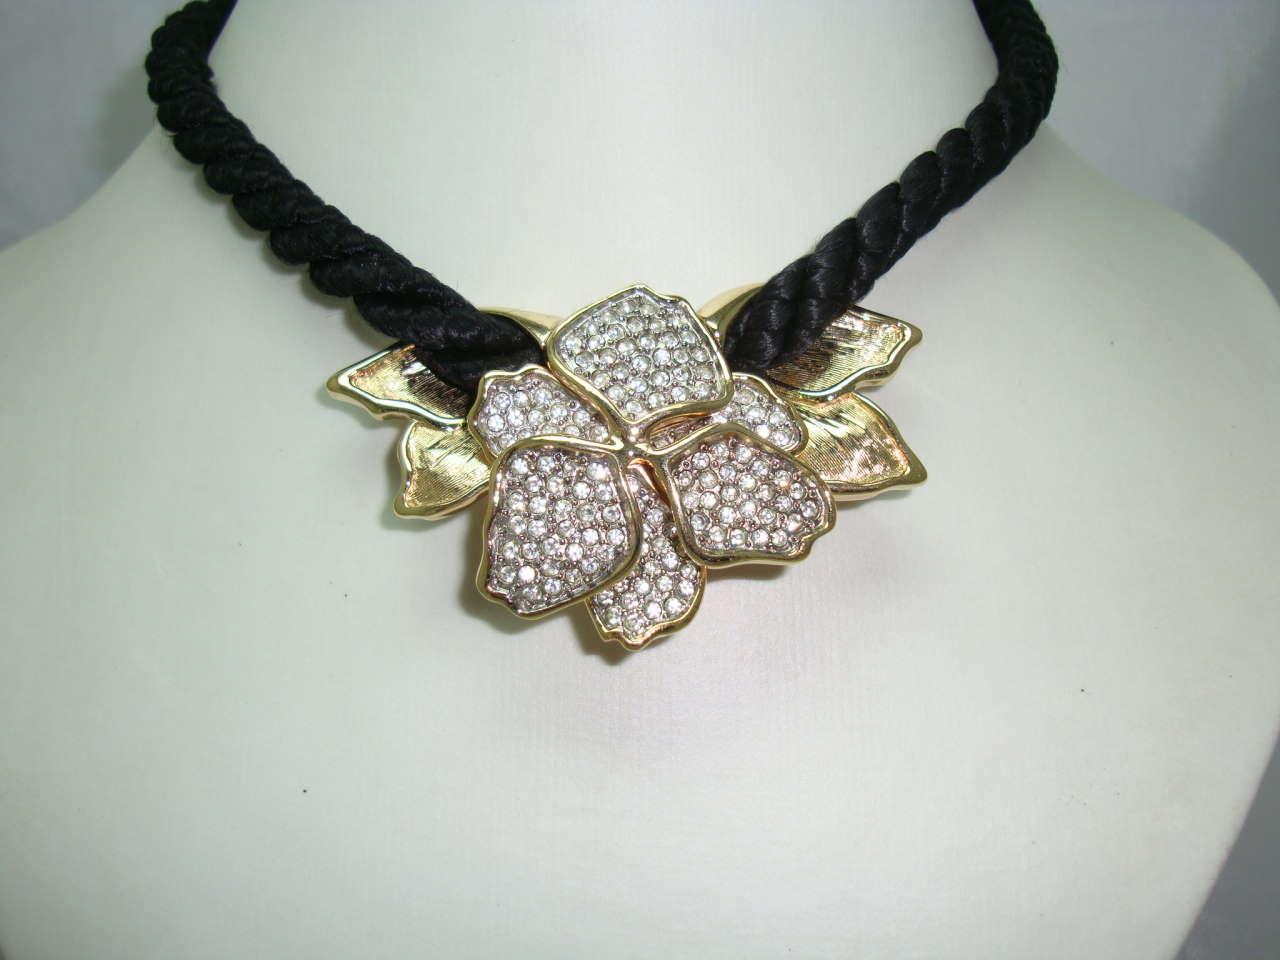 £28.00 - Vintage 80s Designer Diamante Goldtone Pendant Necklace on Black Cord